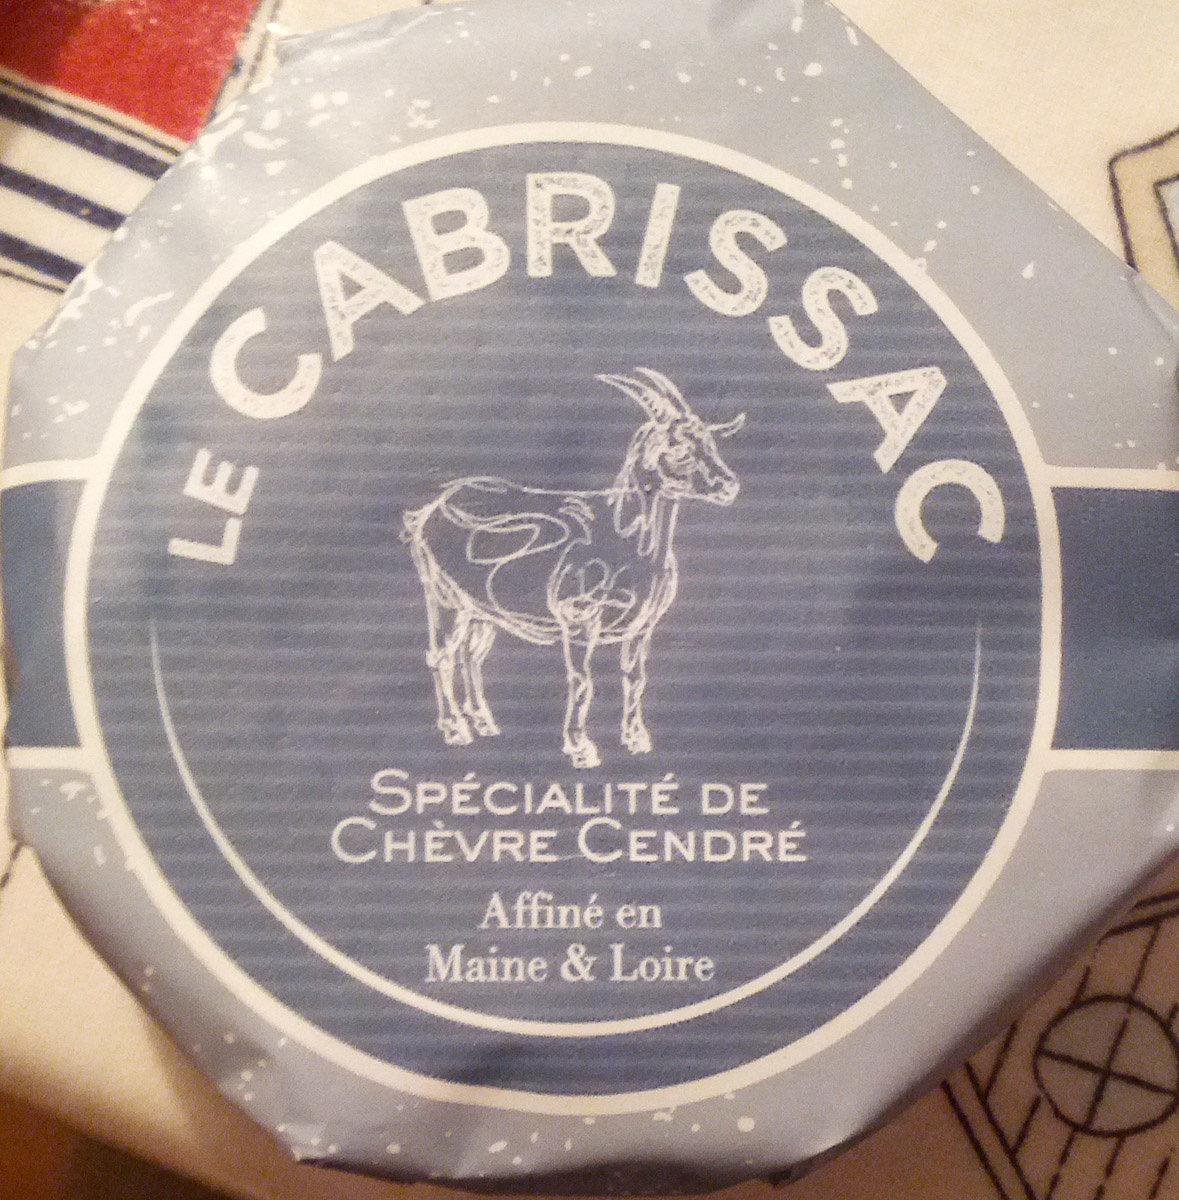 Le Cabrissac - Product - de